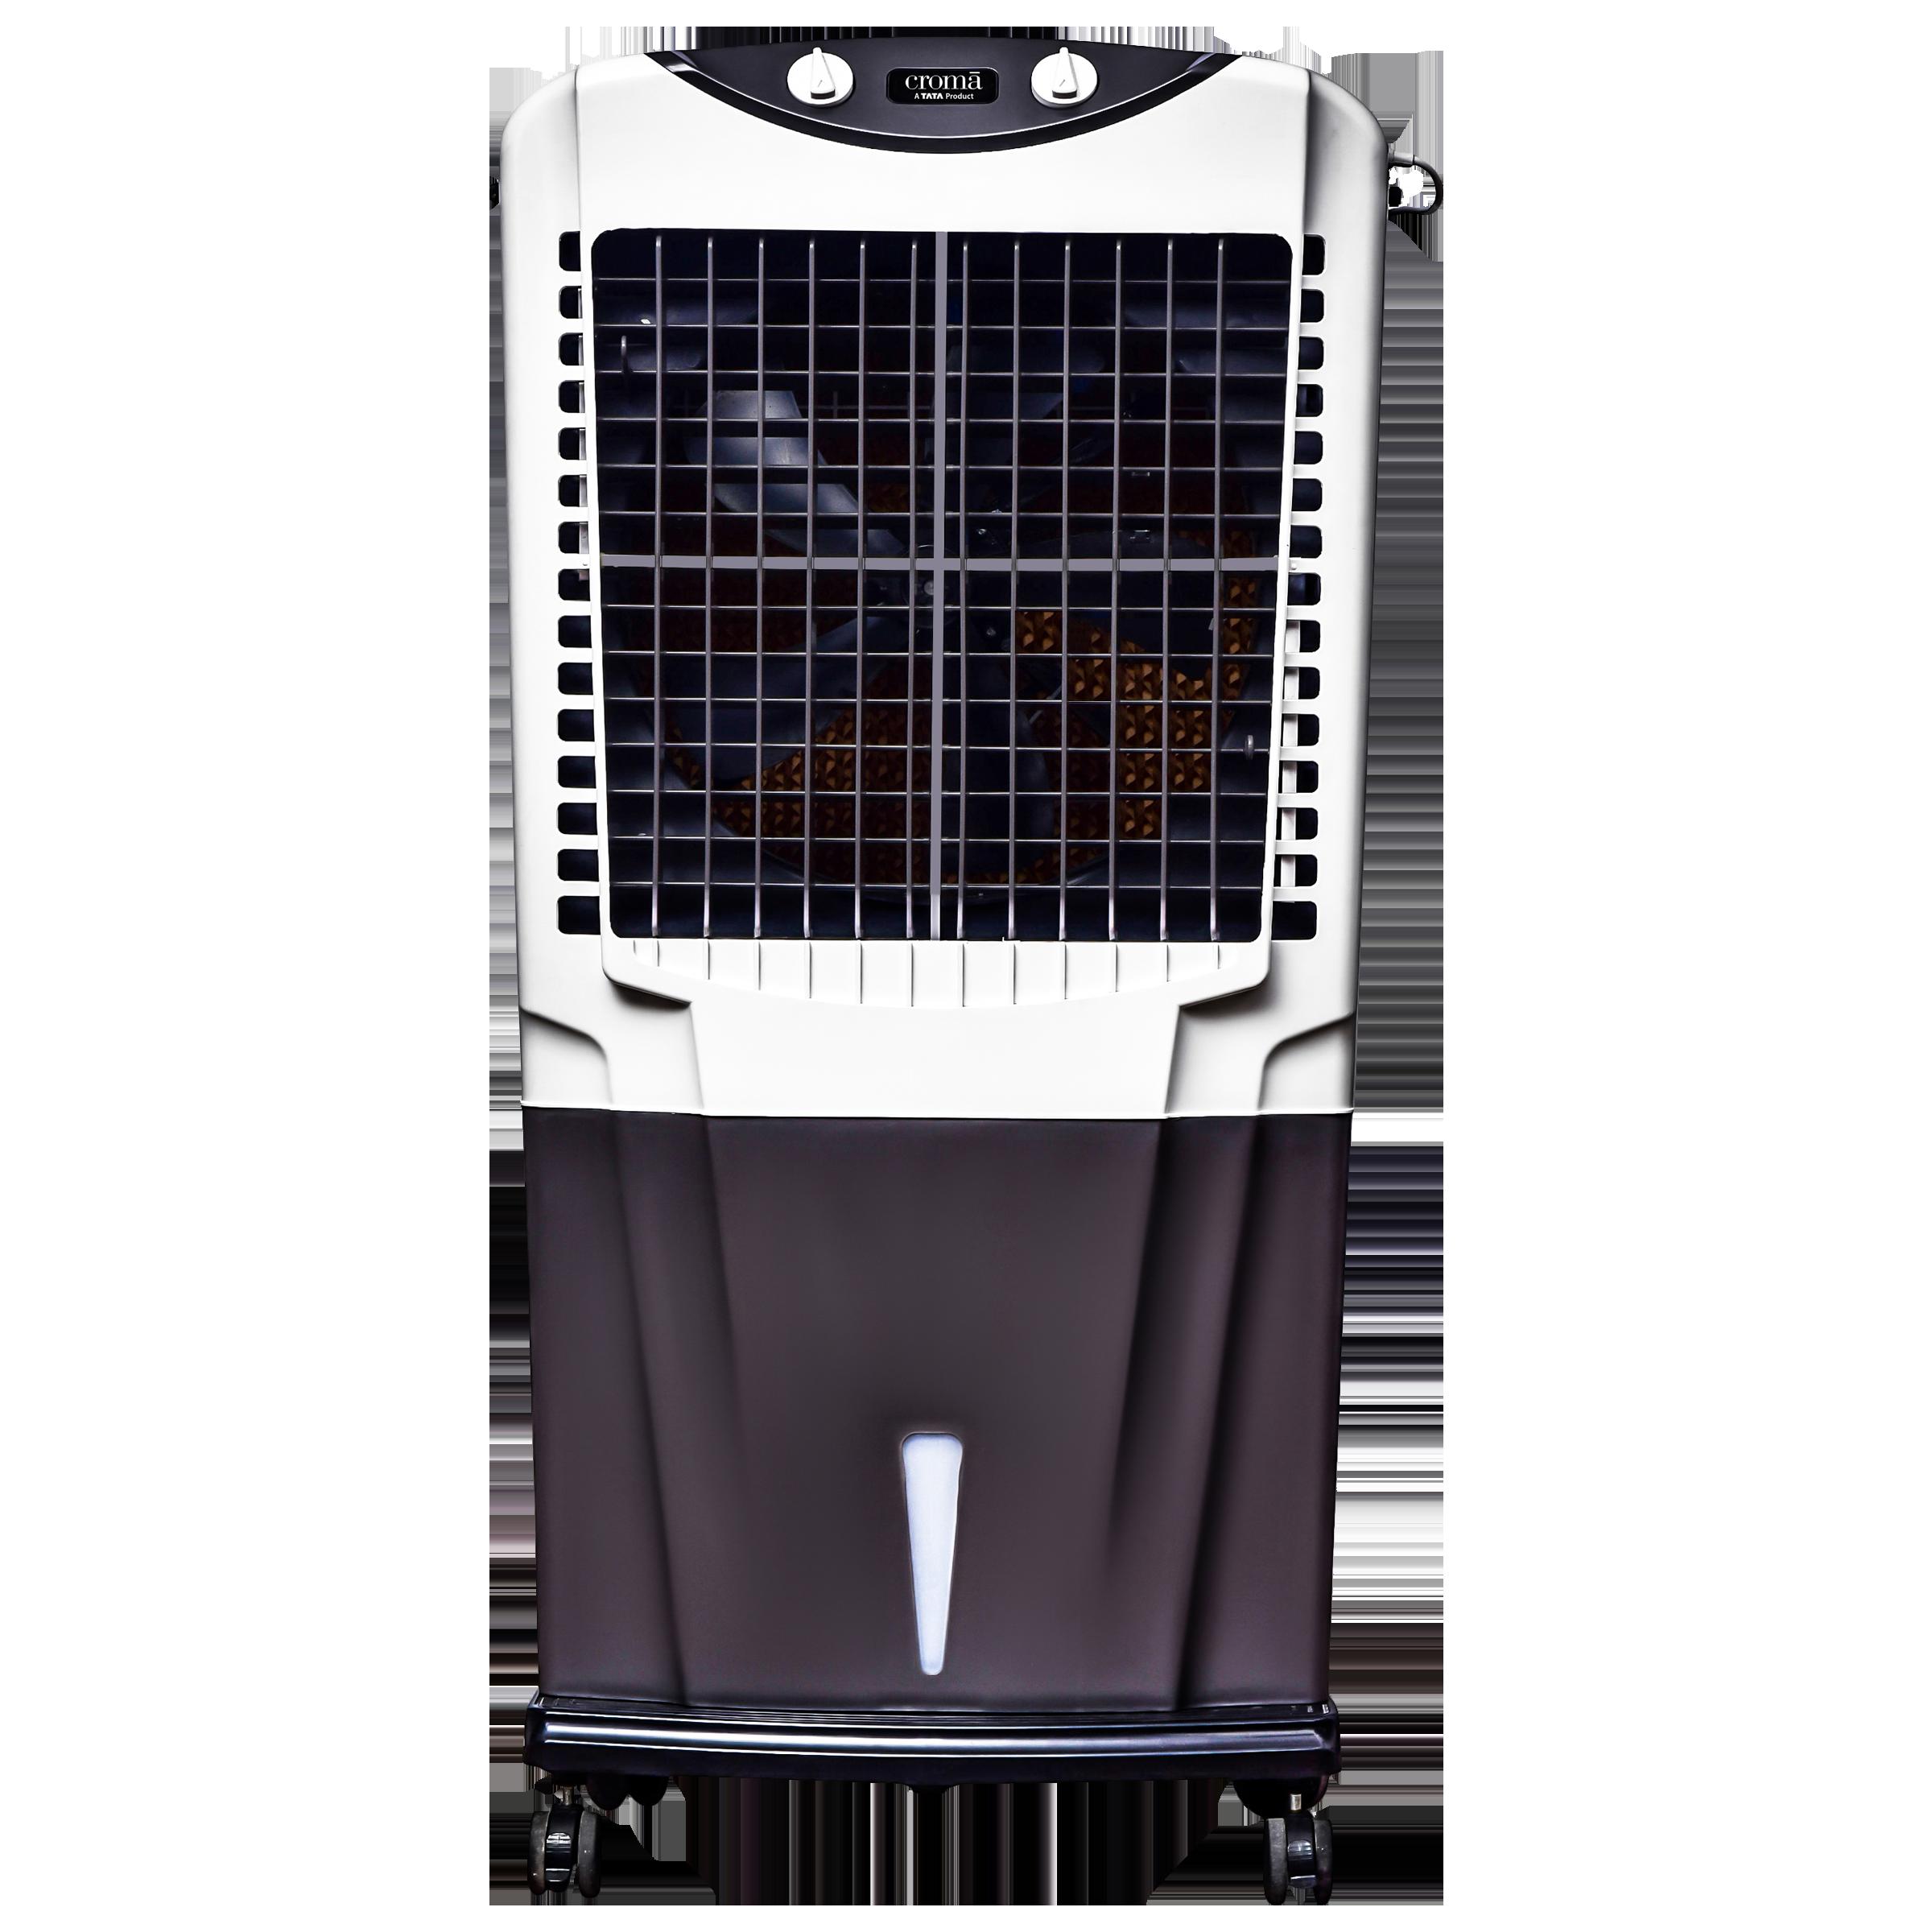 Croma 75 Litres Desert Air Cooler (Inverter Compatible, CRRC1206, White/Grey)_1